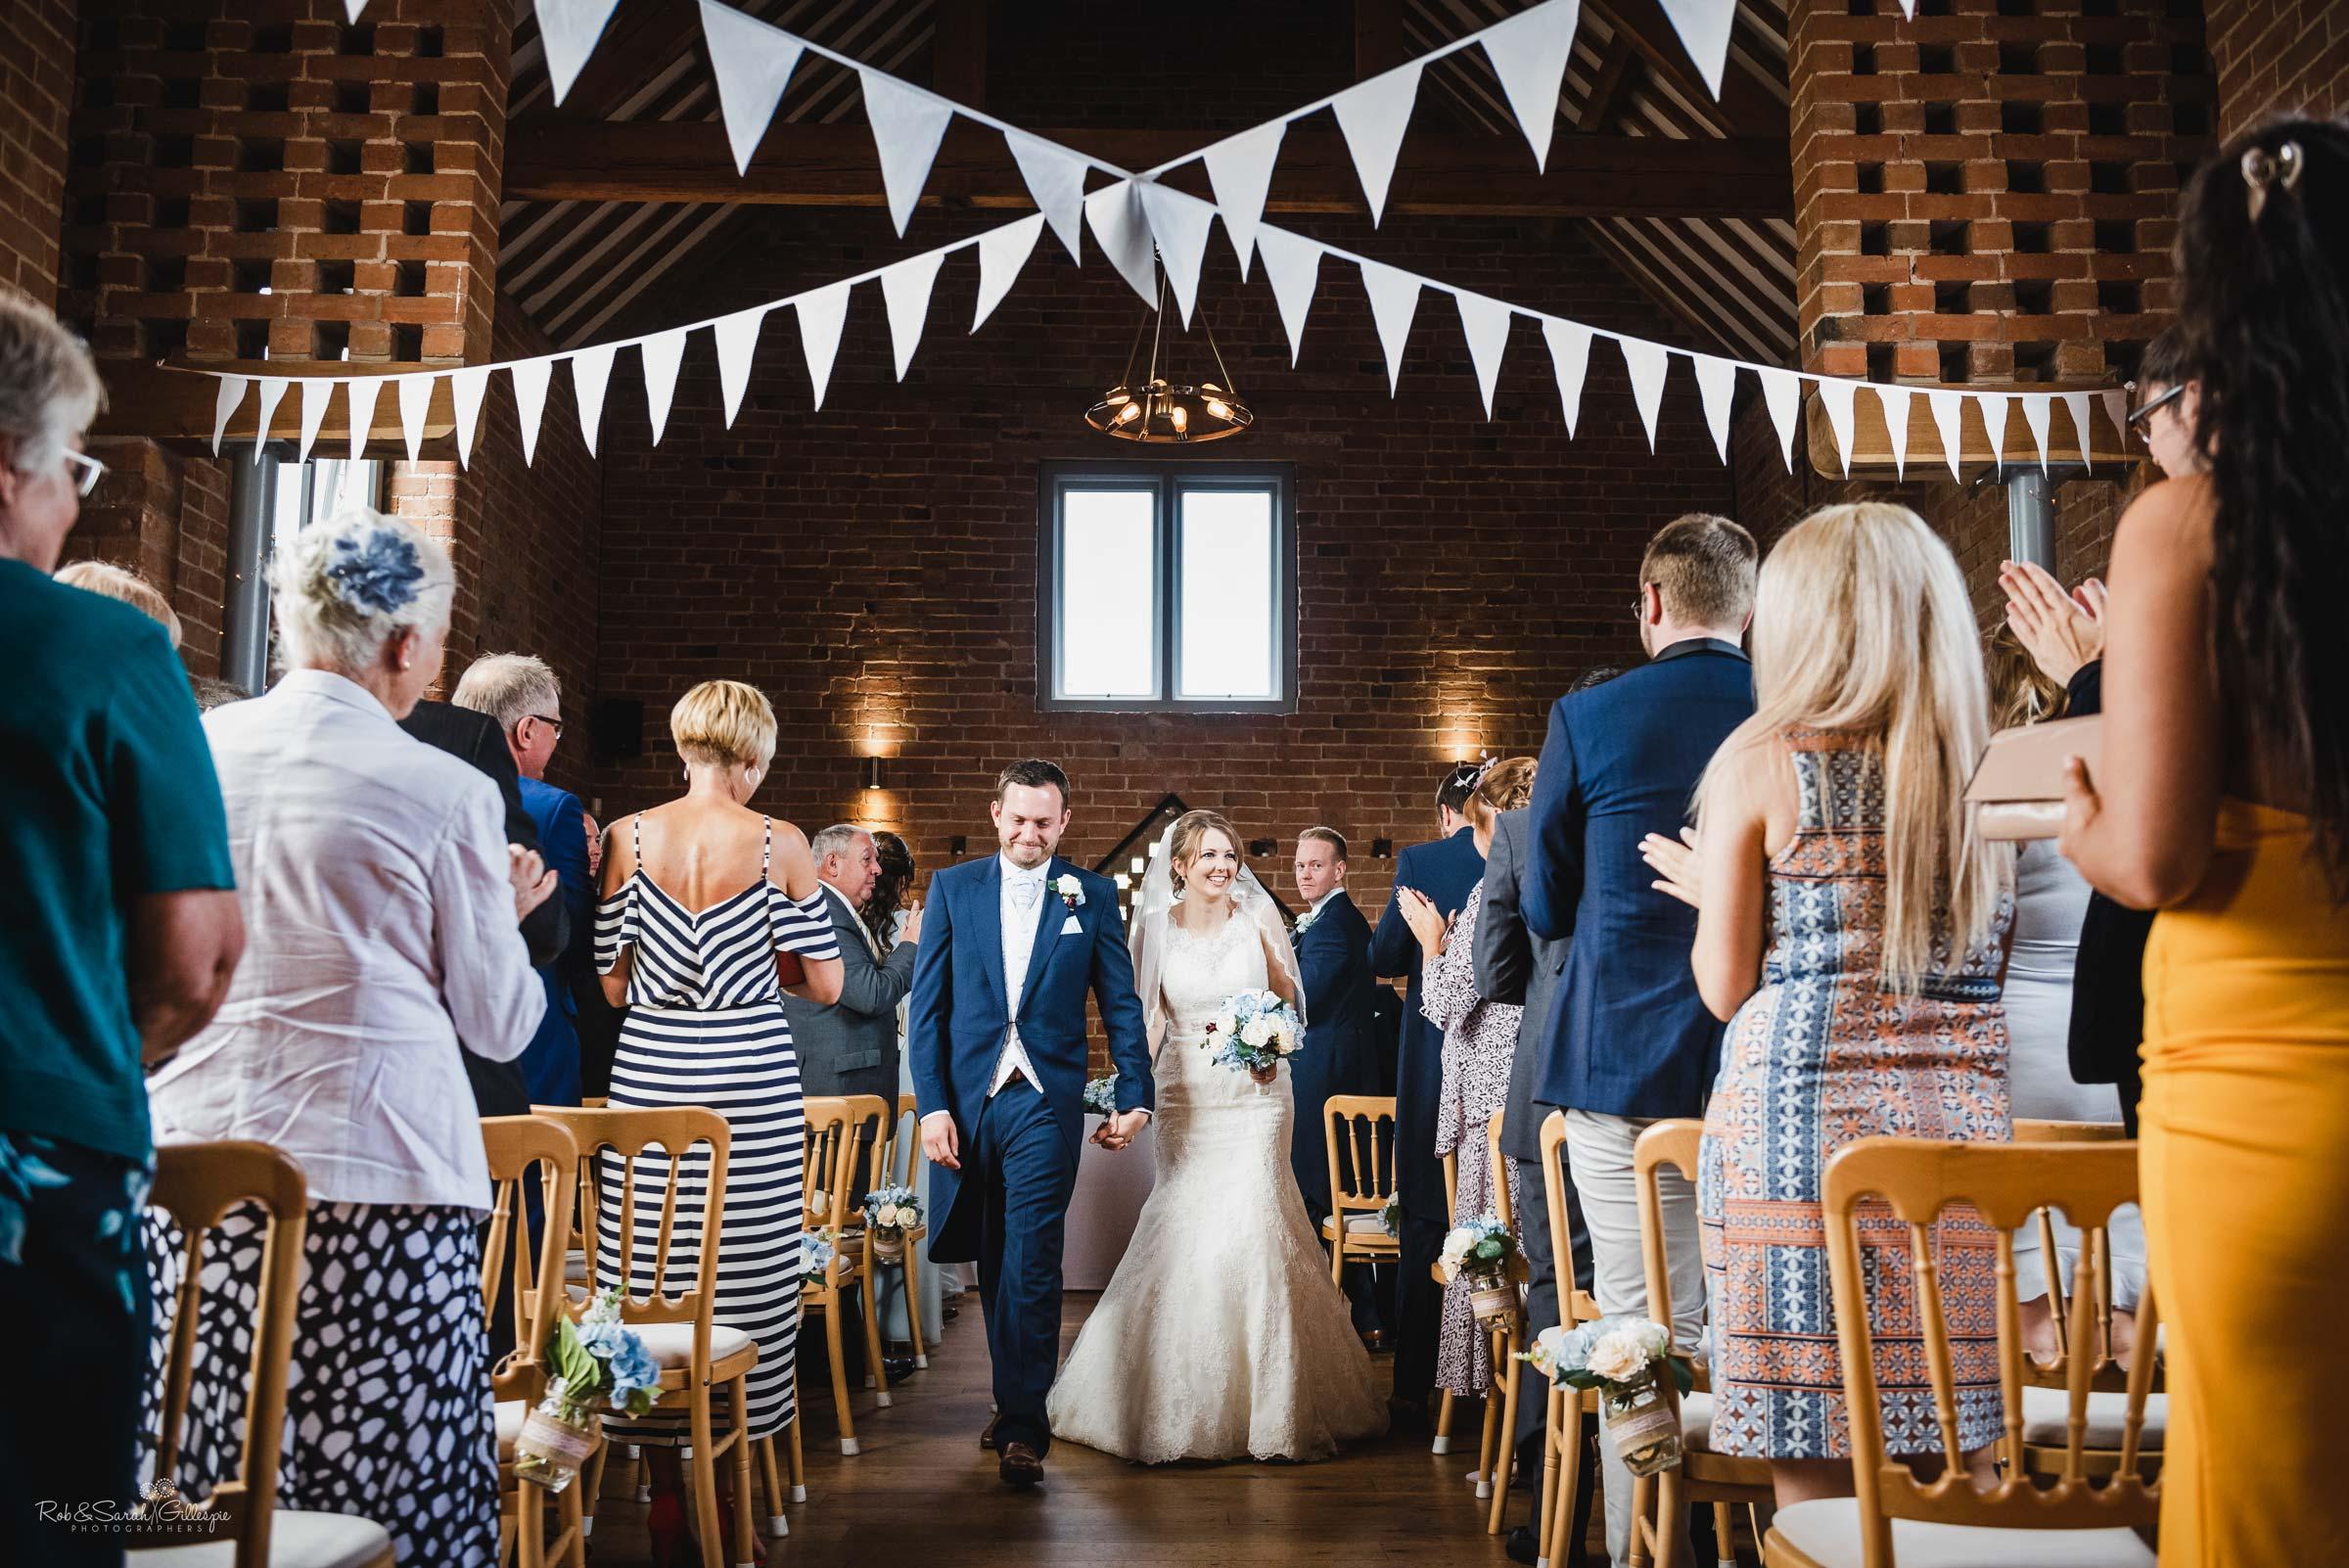 Wedding photography at Swallows Nest Barn in Warwickshire